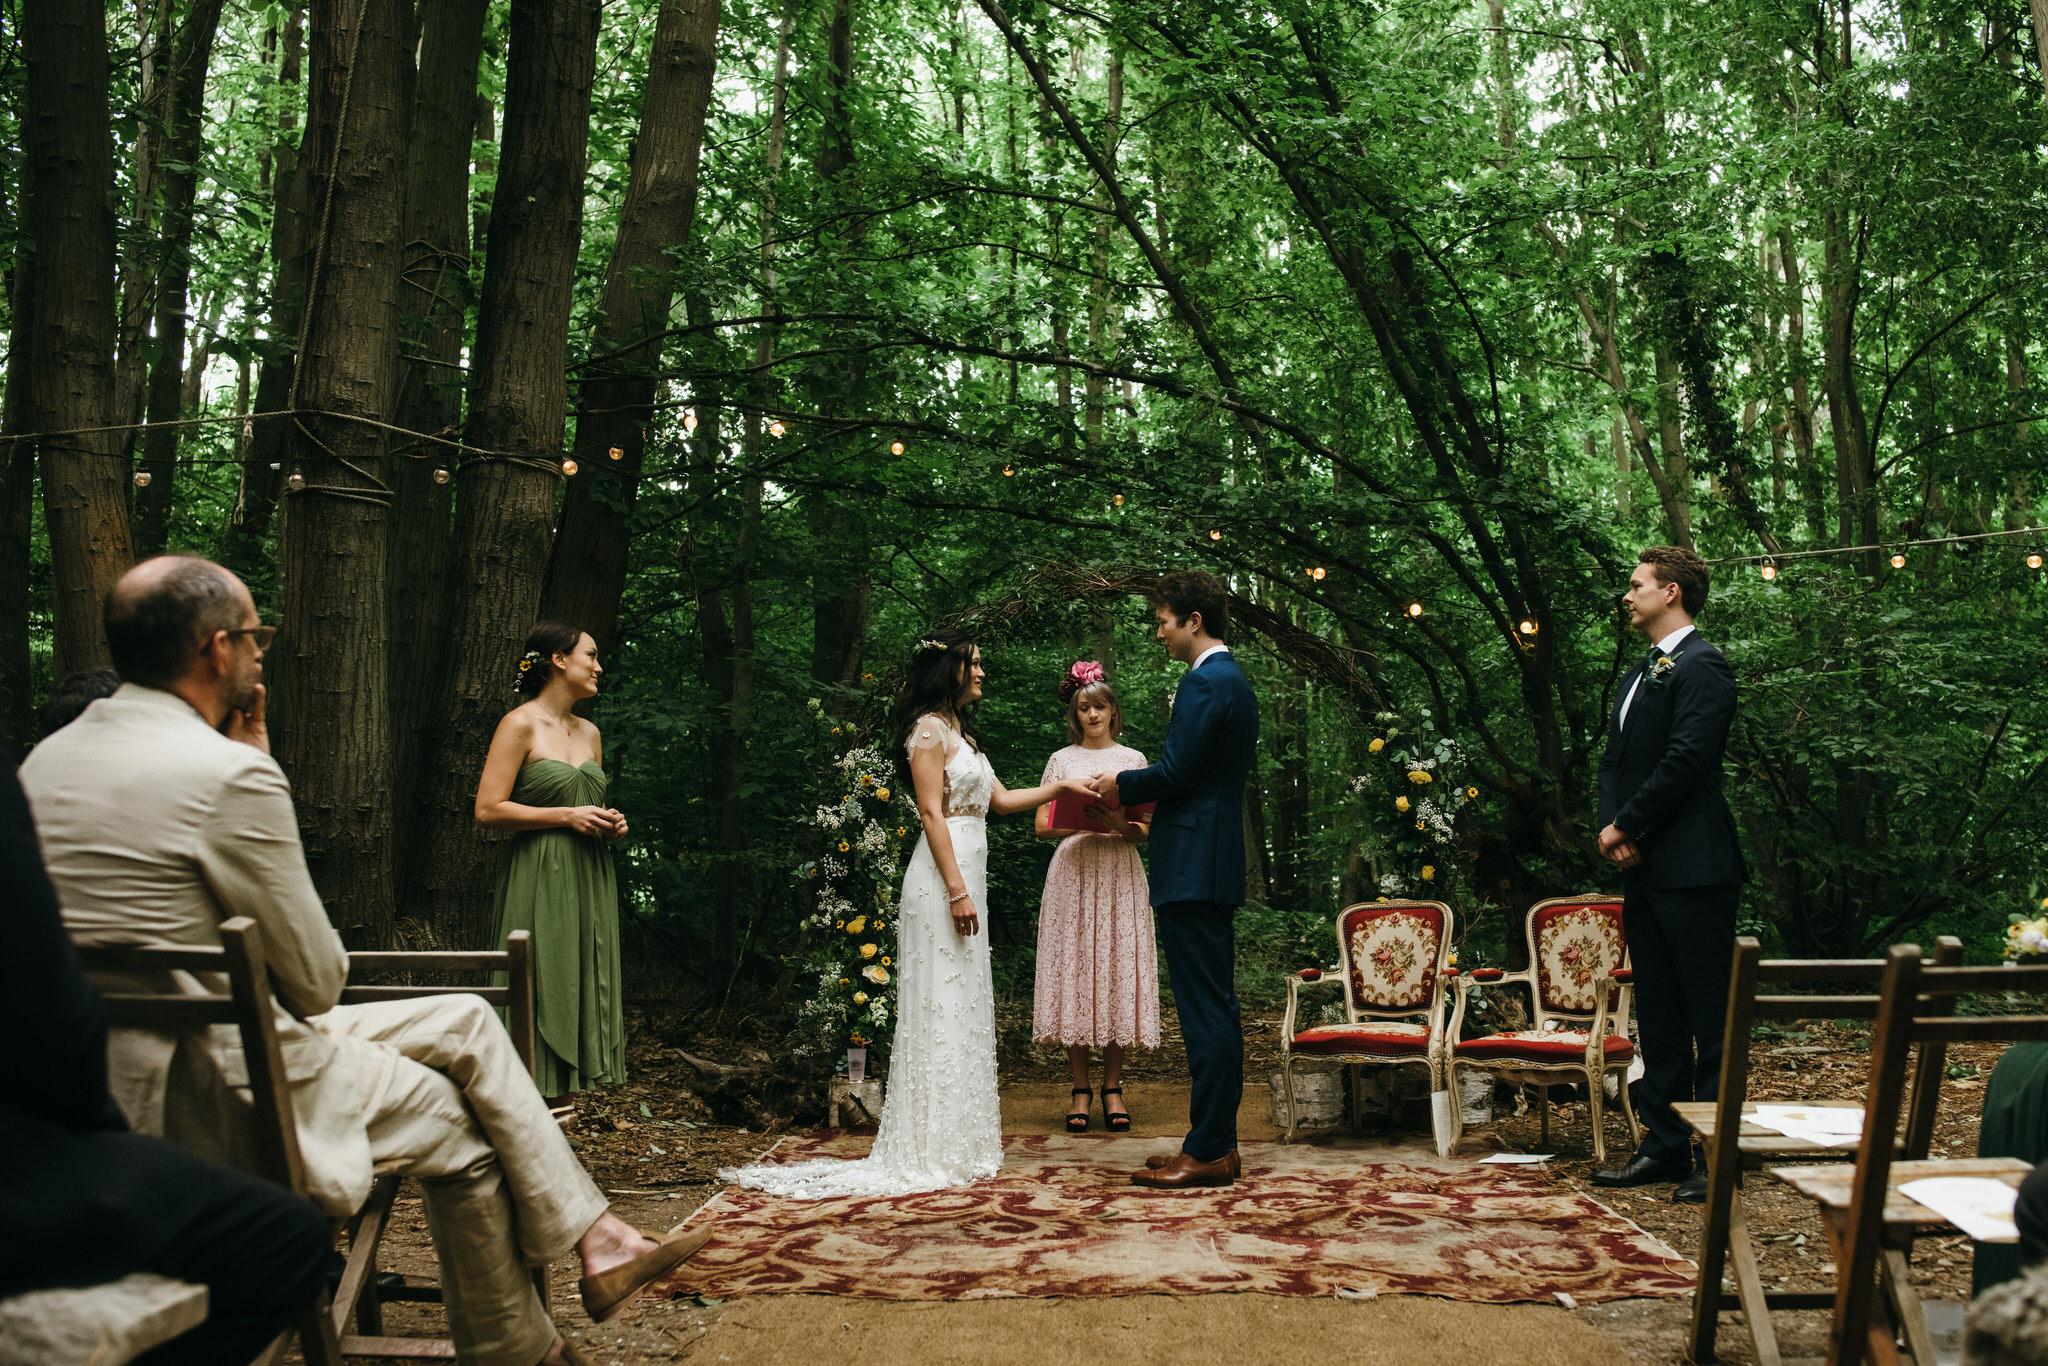 Samantha Kelsie humanist wedding ceremony